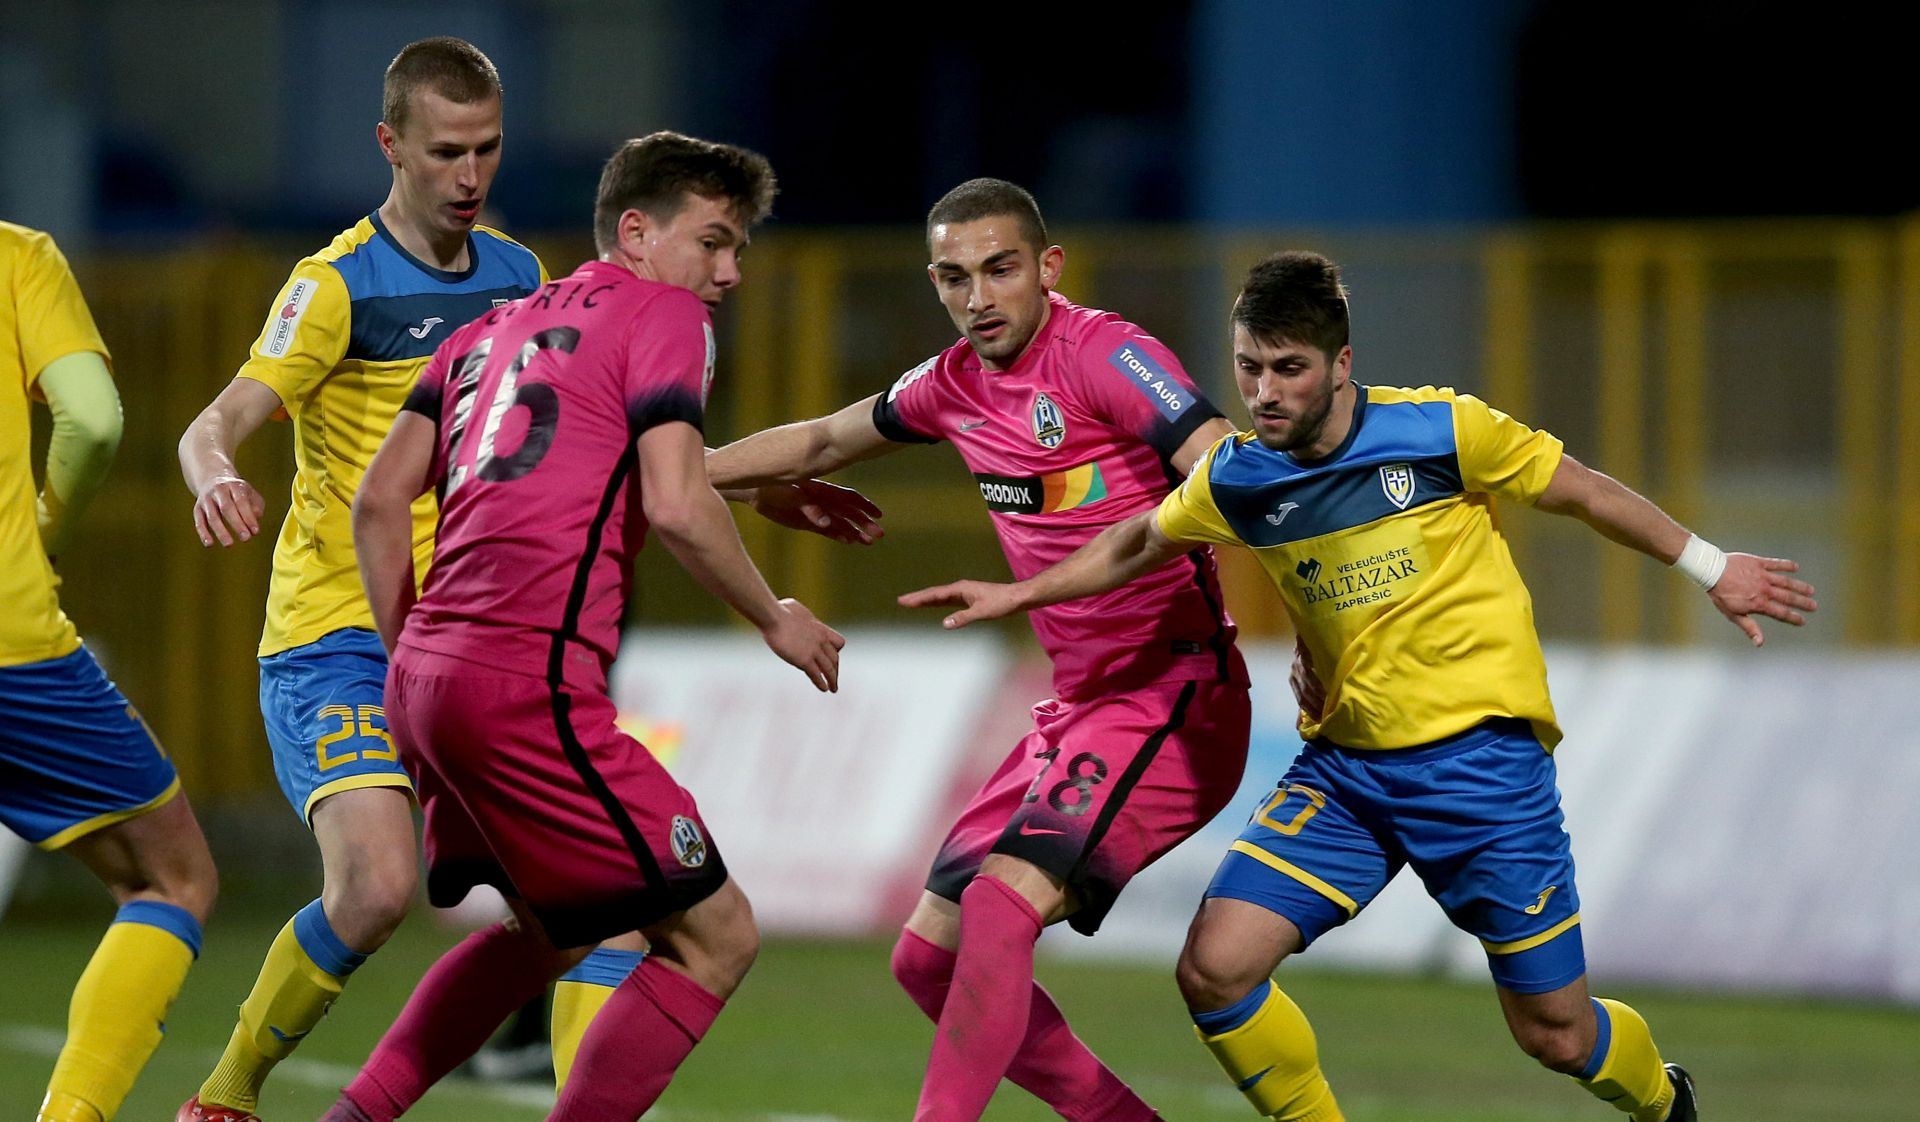 HNL Inter i Lokomotiva bez pogodaka u Zaprešiću